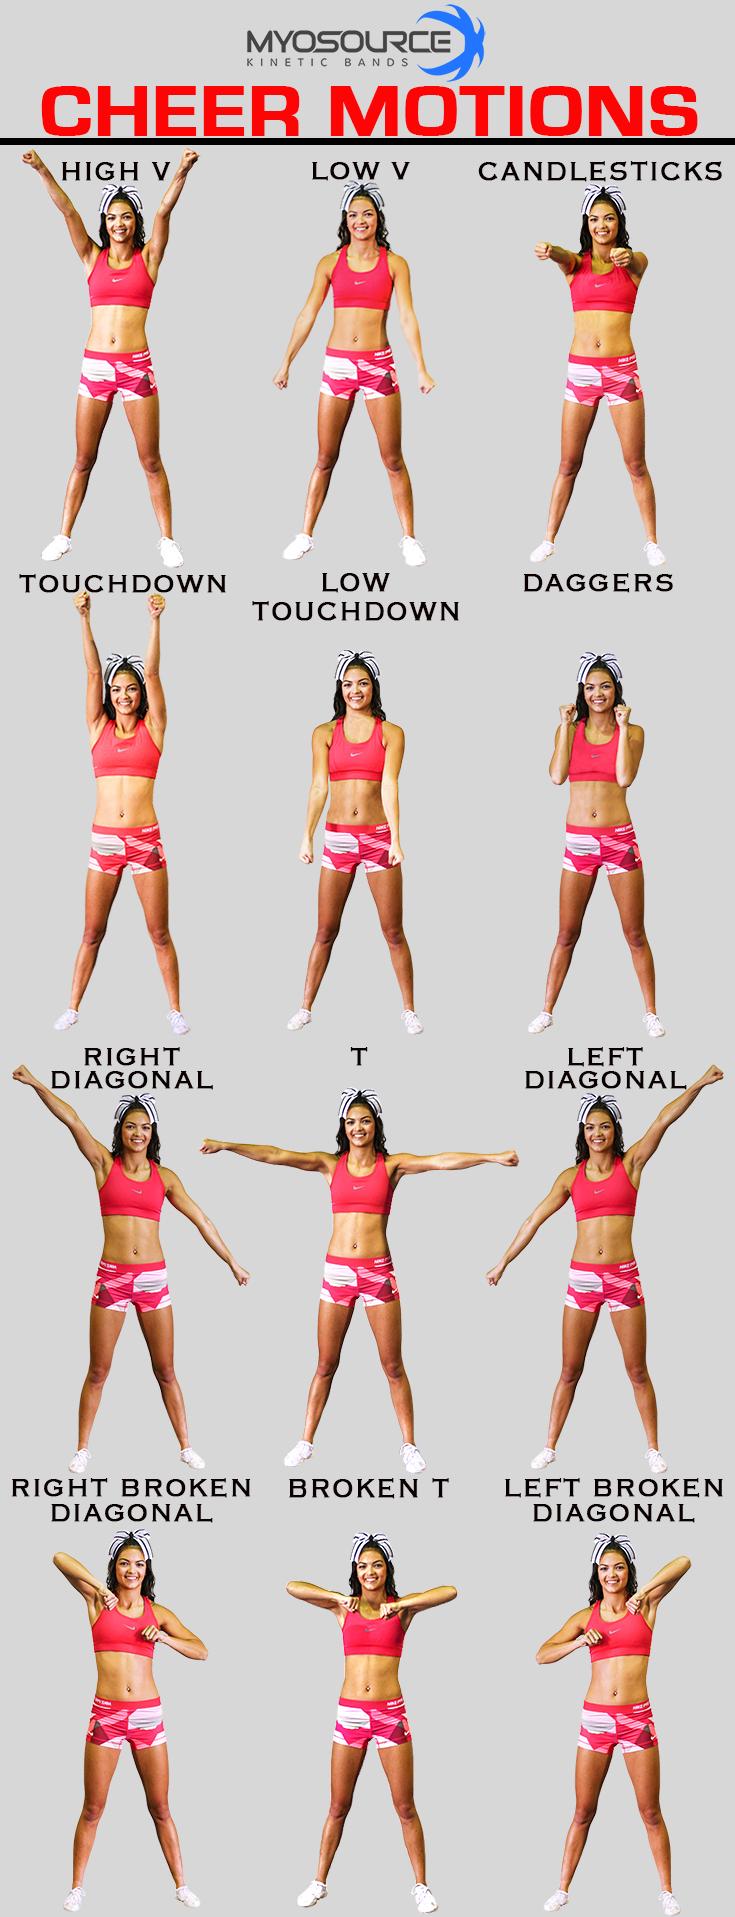 Cheer Motions Chart